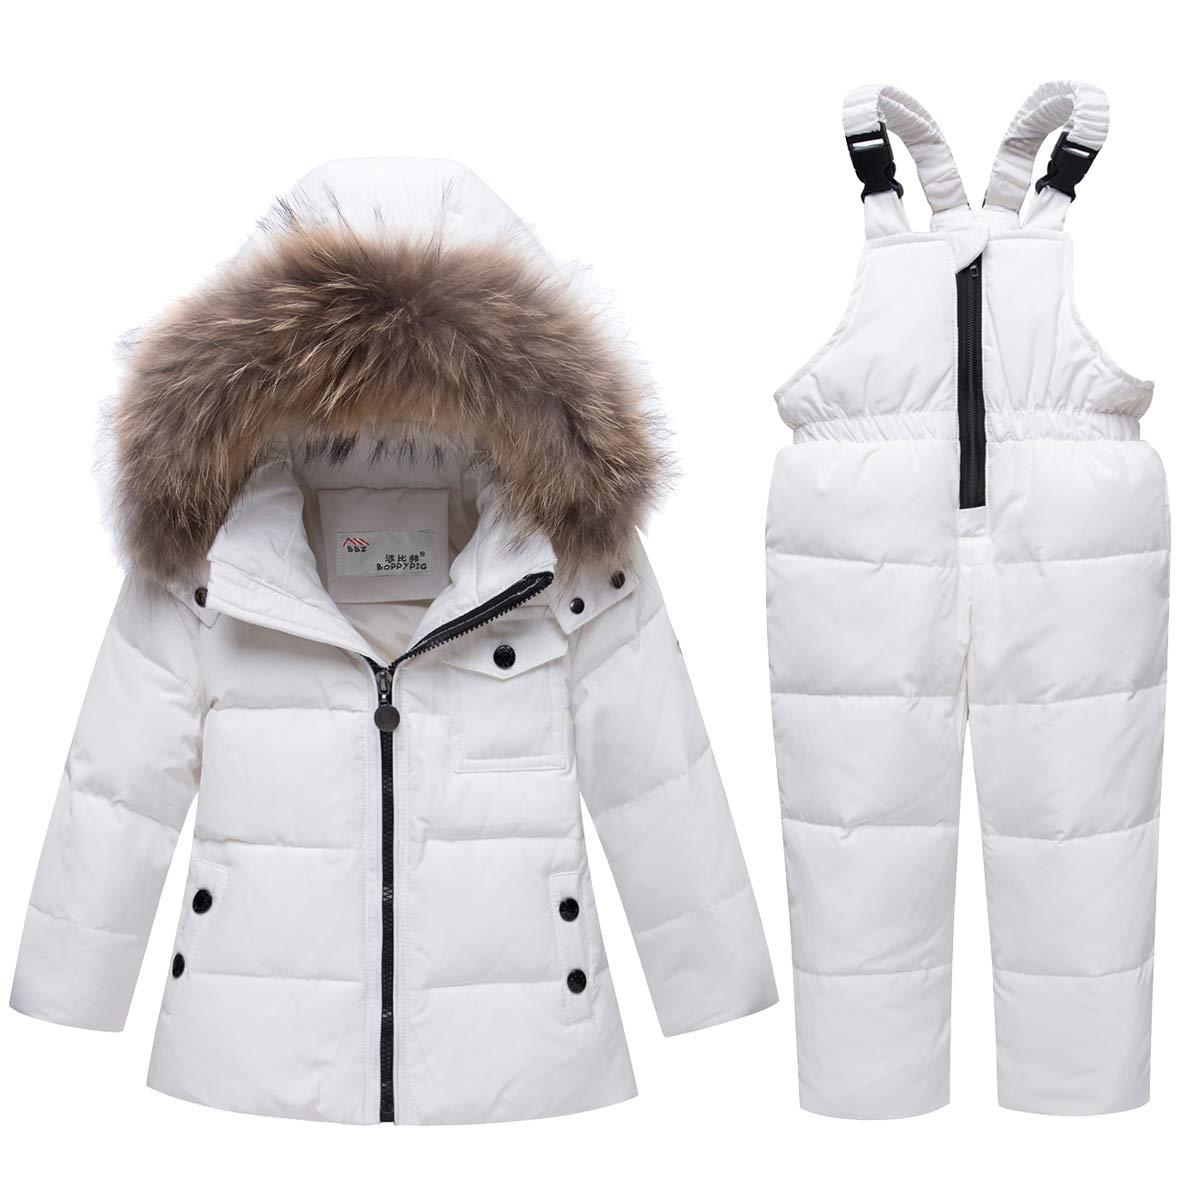 SANMIO Baby Boys Girls Two Piece Snowsuit, Winter Hooded Puffer Down Jacket Snowsuit with Ski Bib Pants Set for Kids (White, 3-4T) by SANMIO